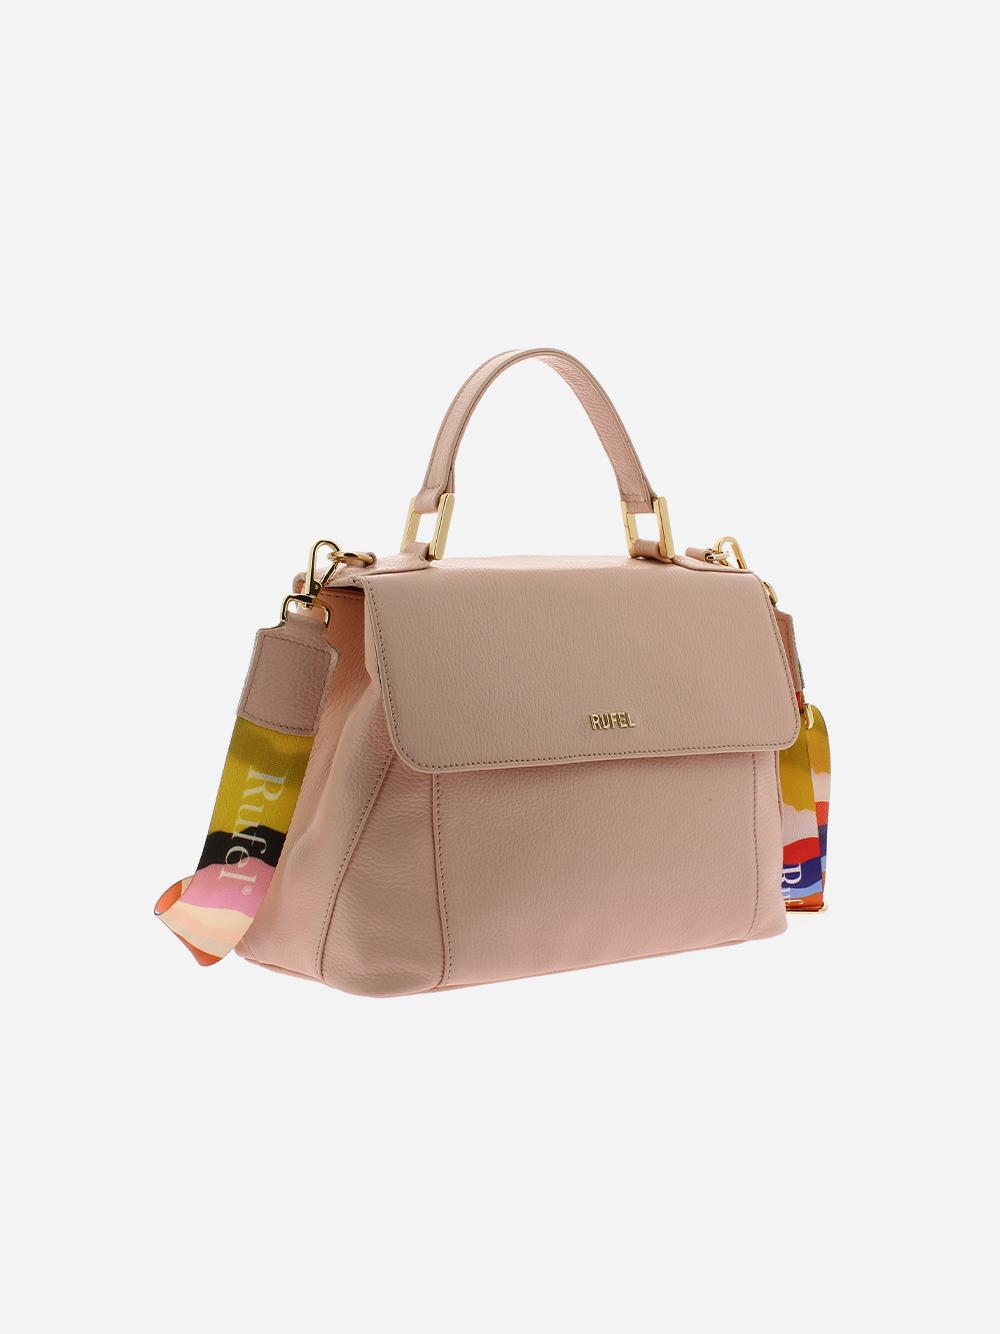 Nude Handbag